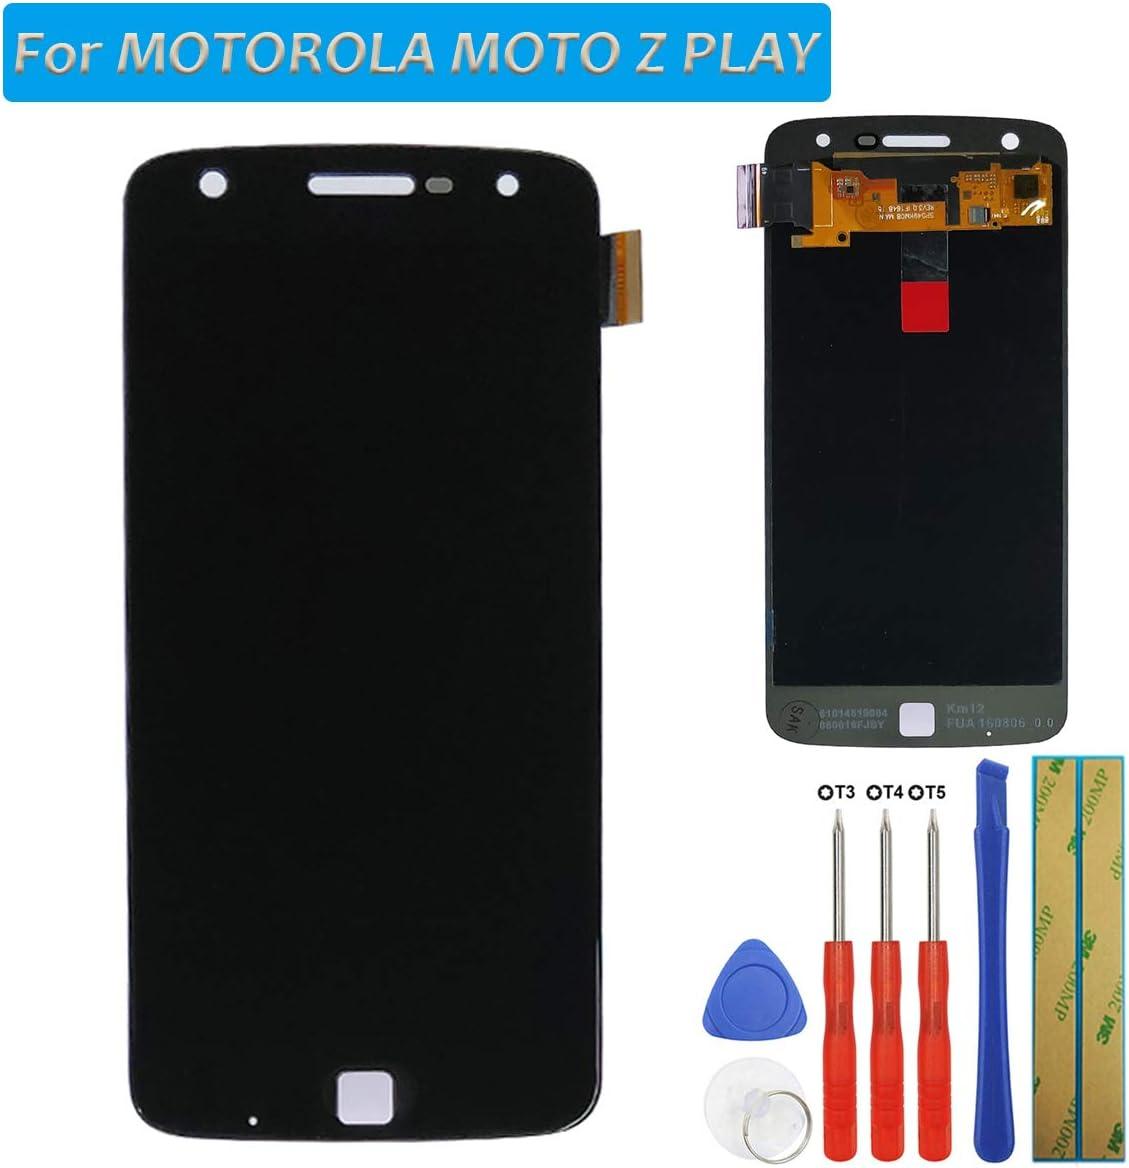 melph yreal para Motorola Moto Z Play AMOLED Pantalla Táctil Cristal Repuesto Pantalla LCD digitalizador (Negro) + Herramientas: Amazon.es: Electrónica